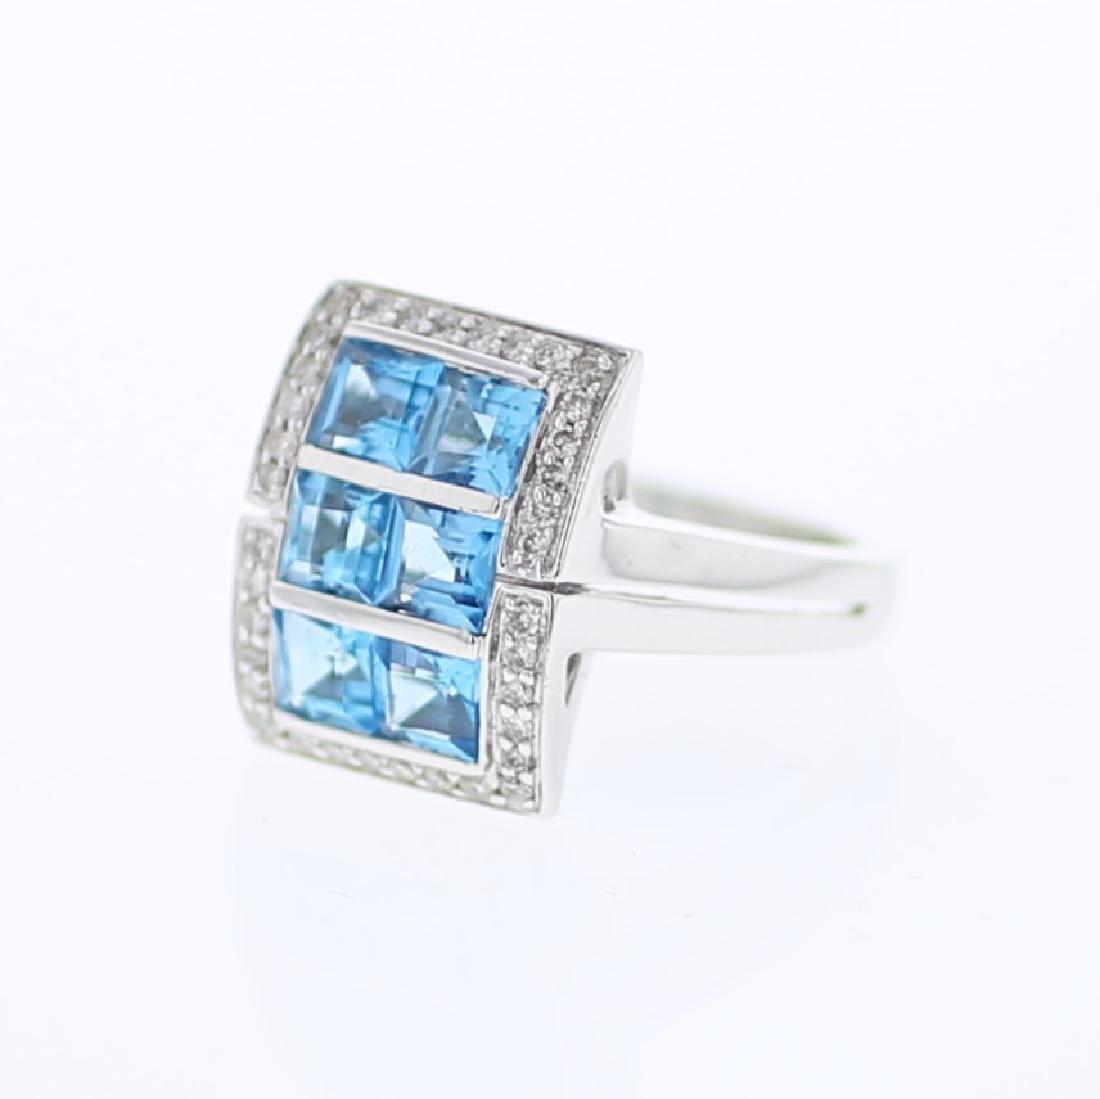 14KT White Gold 2.54ctw Blue Topaz and Diamond Ring